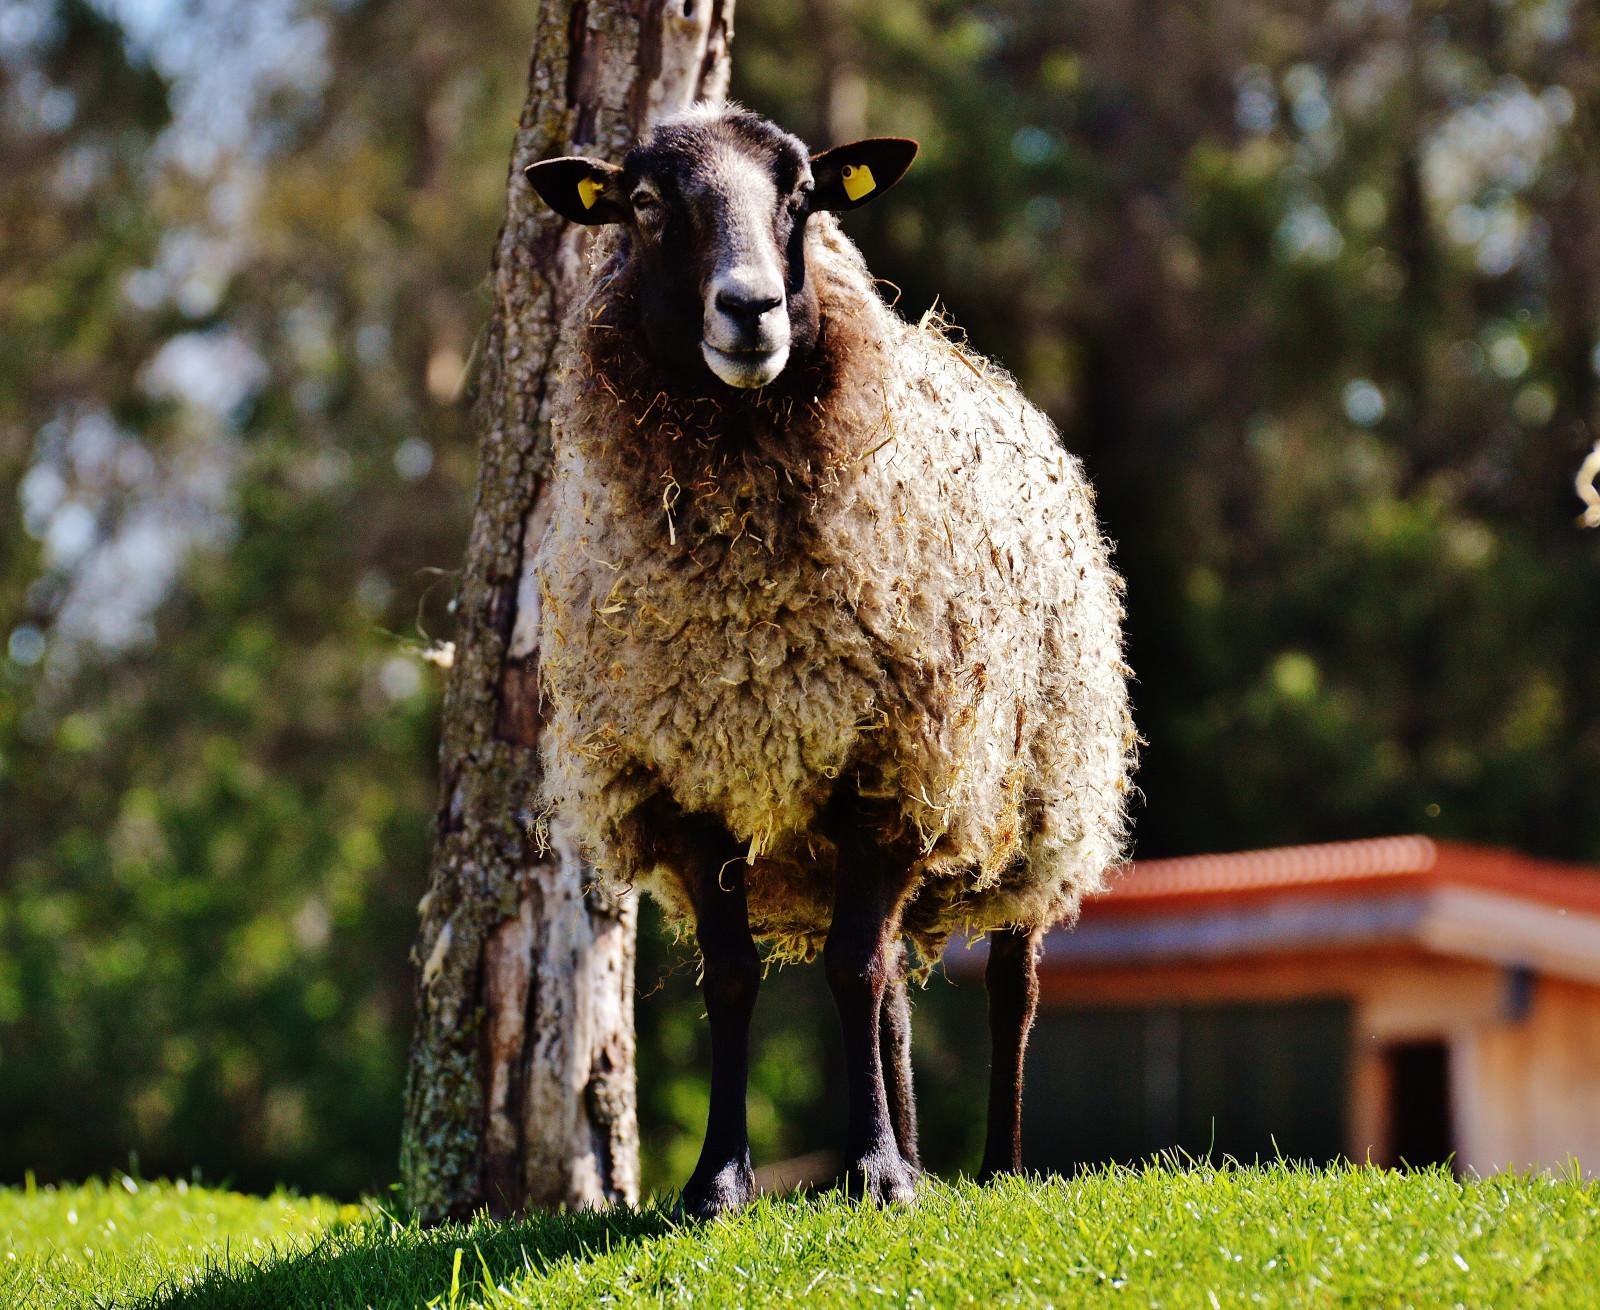 Открытка овечка фото, открыток днем